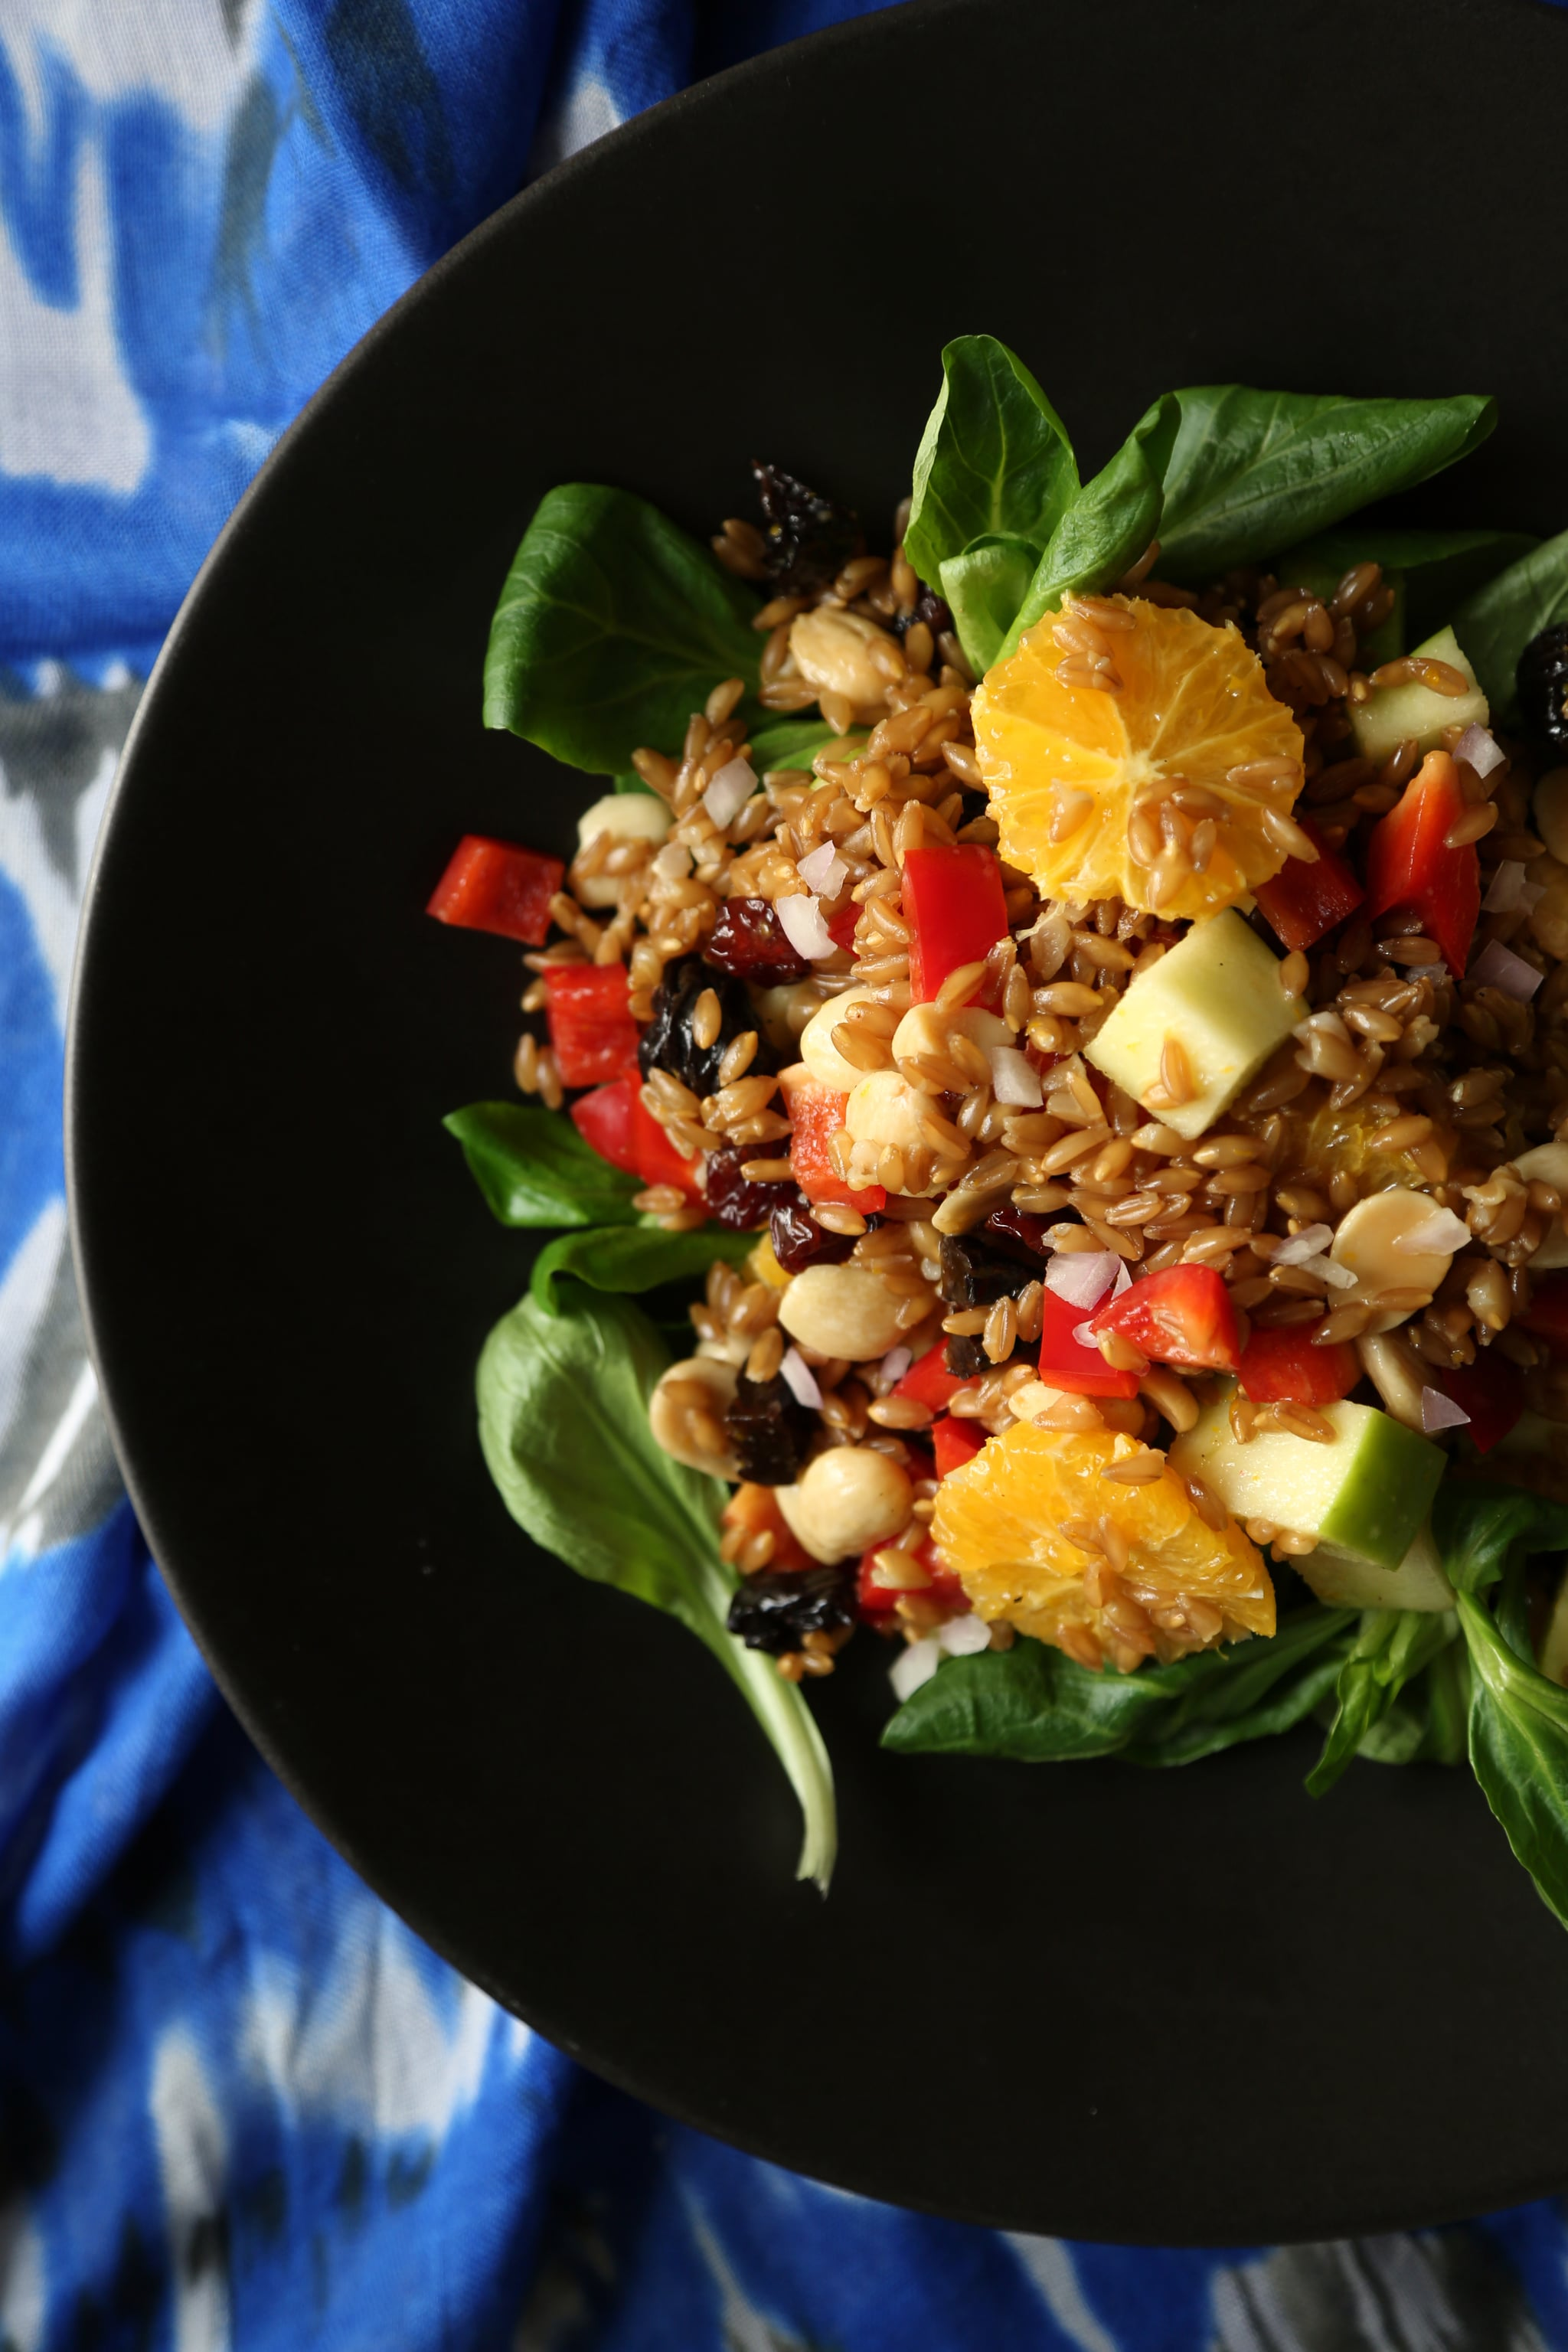 Guy Fieri Goes Vegan For This Farro Salad